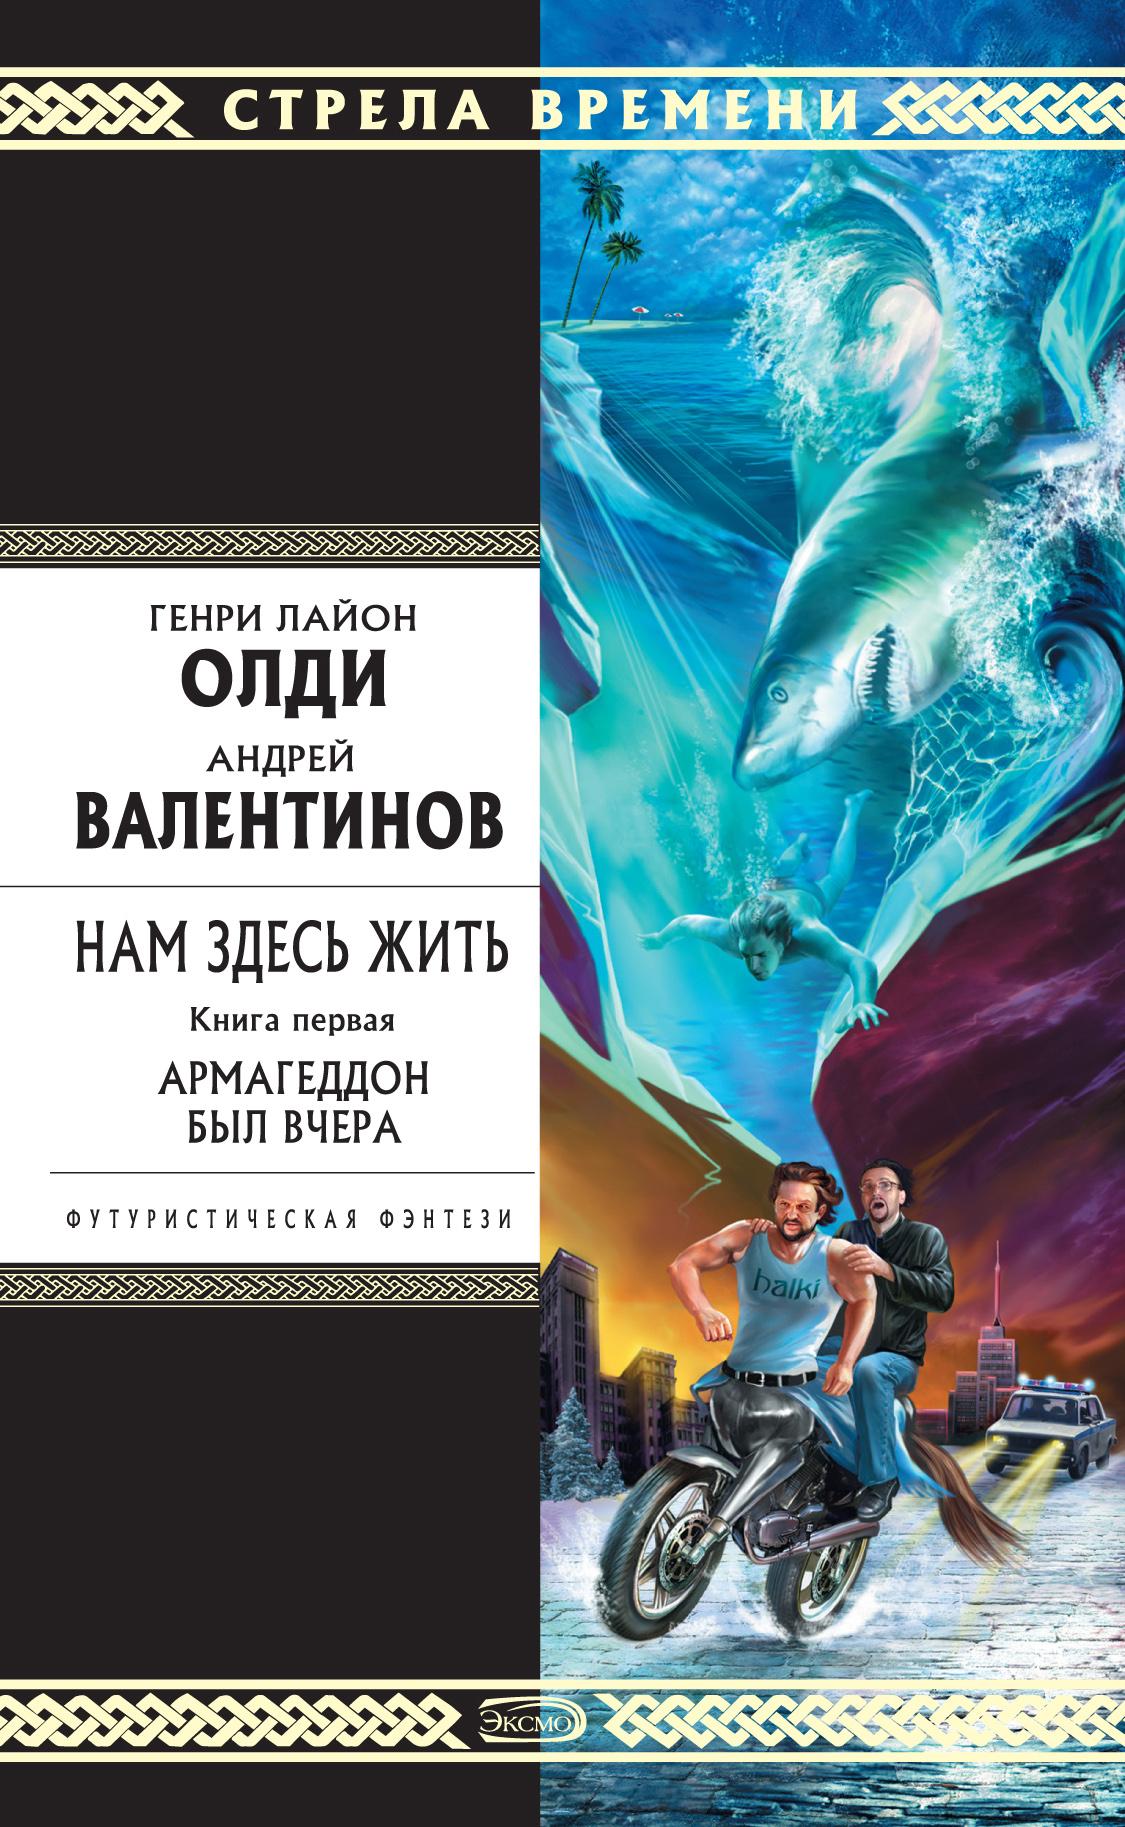 Генри Олди, Андрей Валентинов «Армагеддон был вчера»